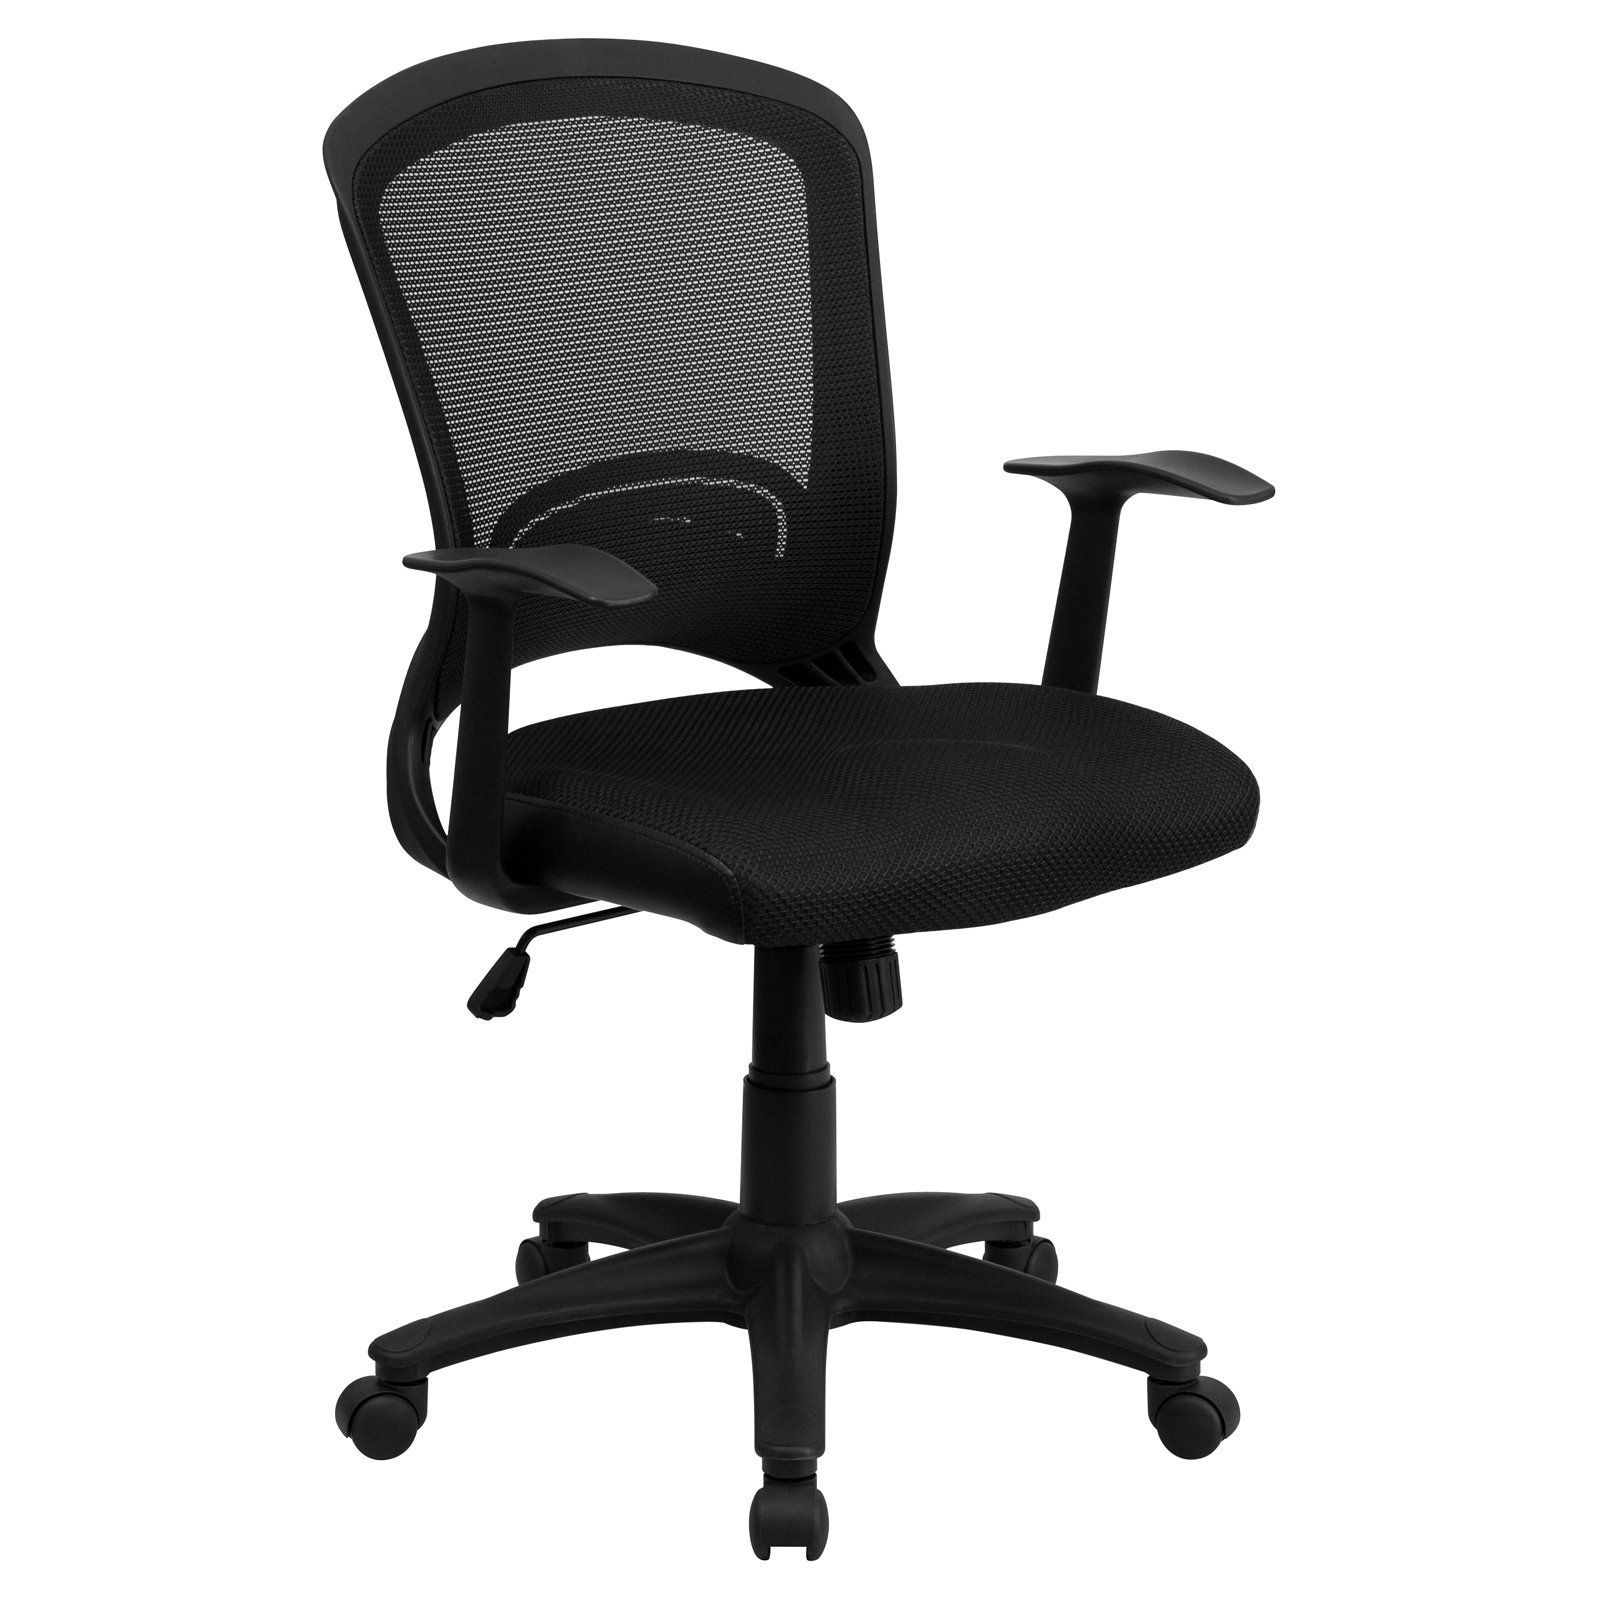 Flash furniture midback mesh swivel task chair with mesh padded